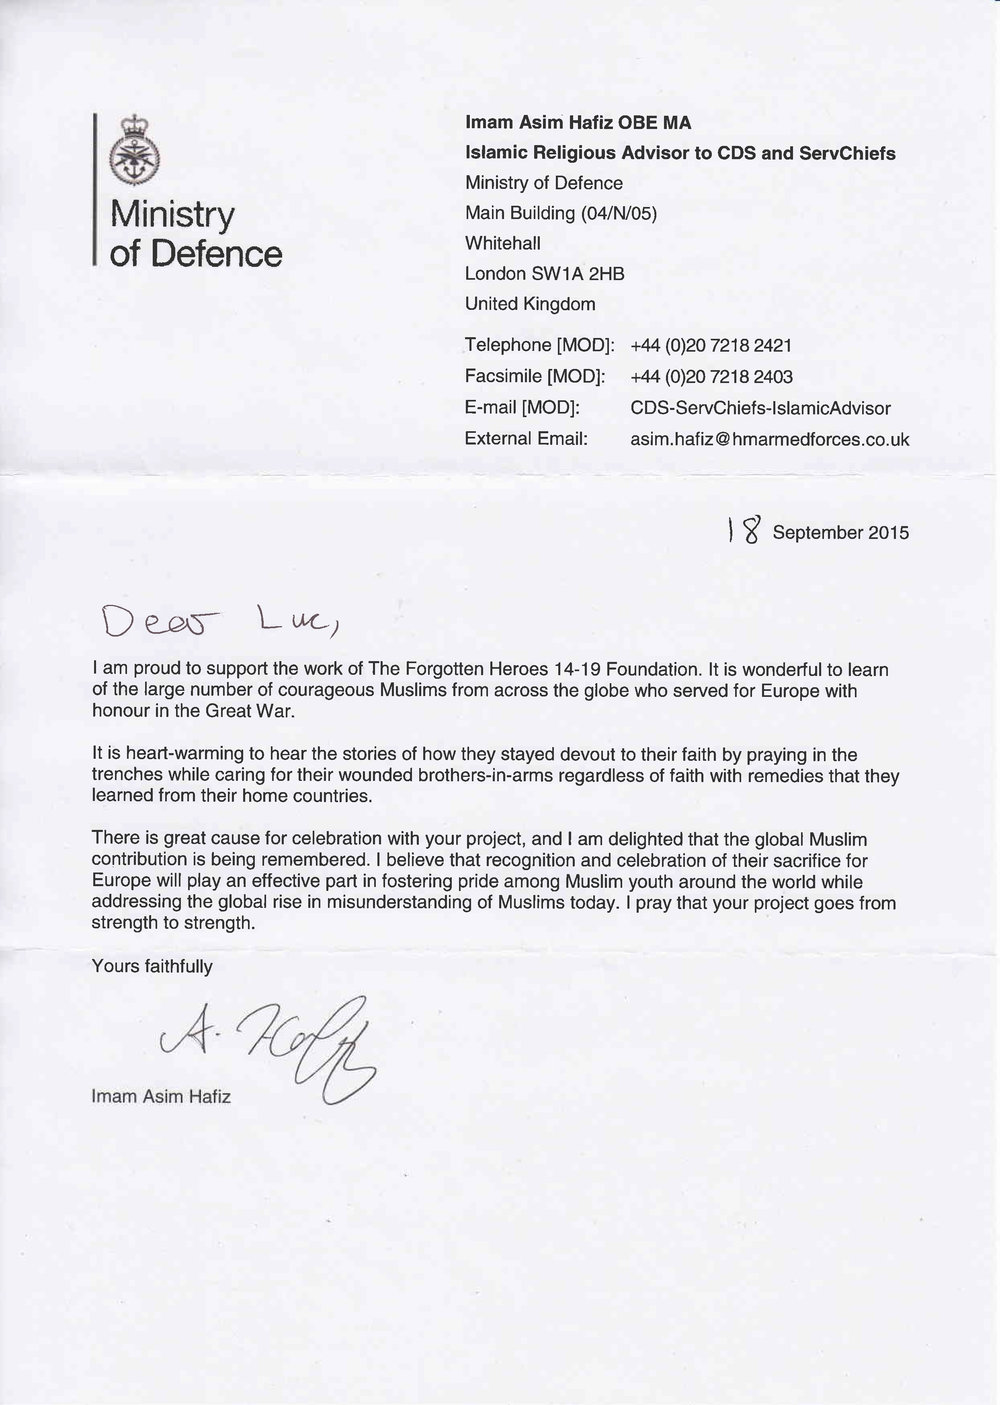 Imam Asim Hafiz OBE MA 400dpi.jpg